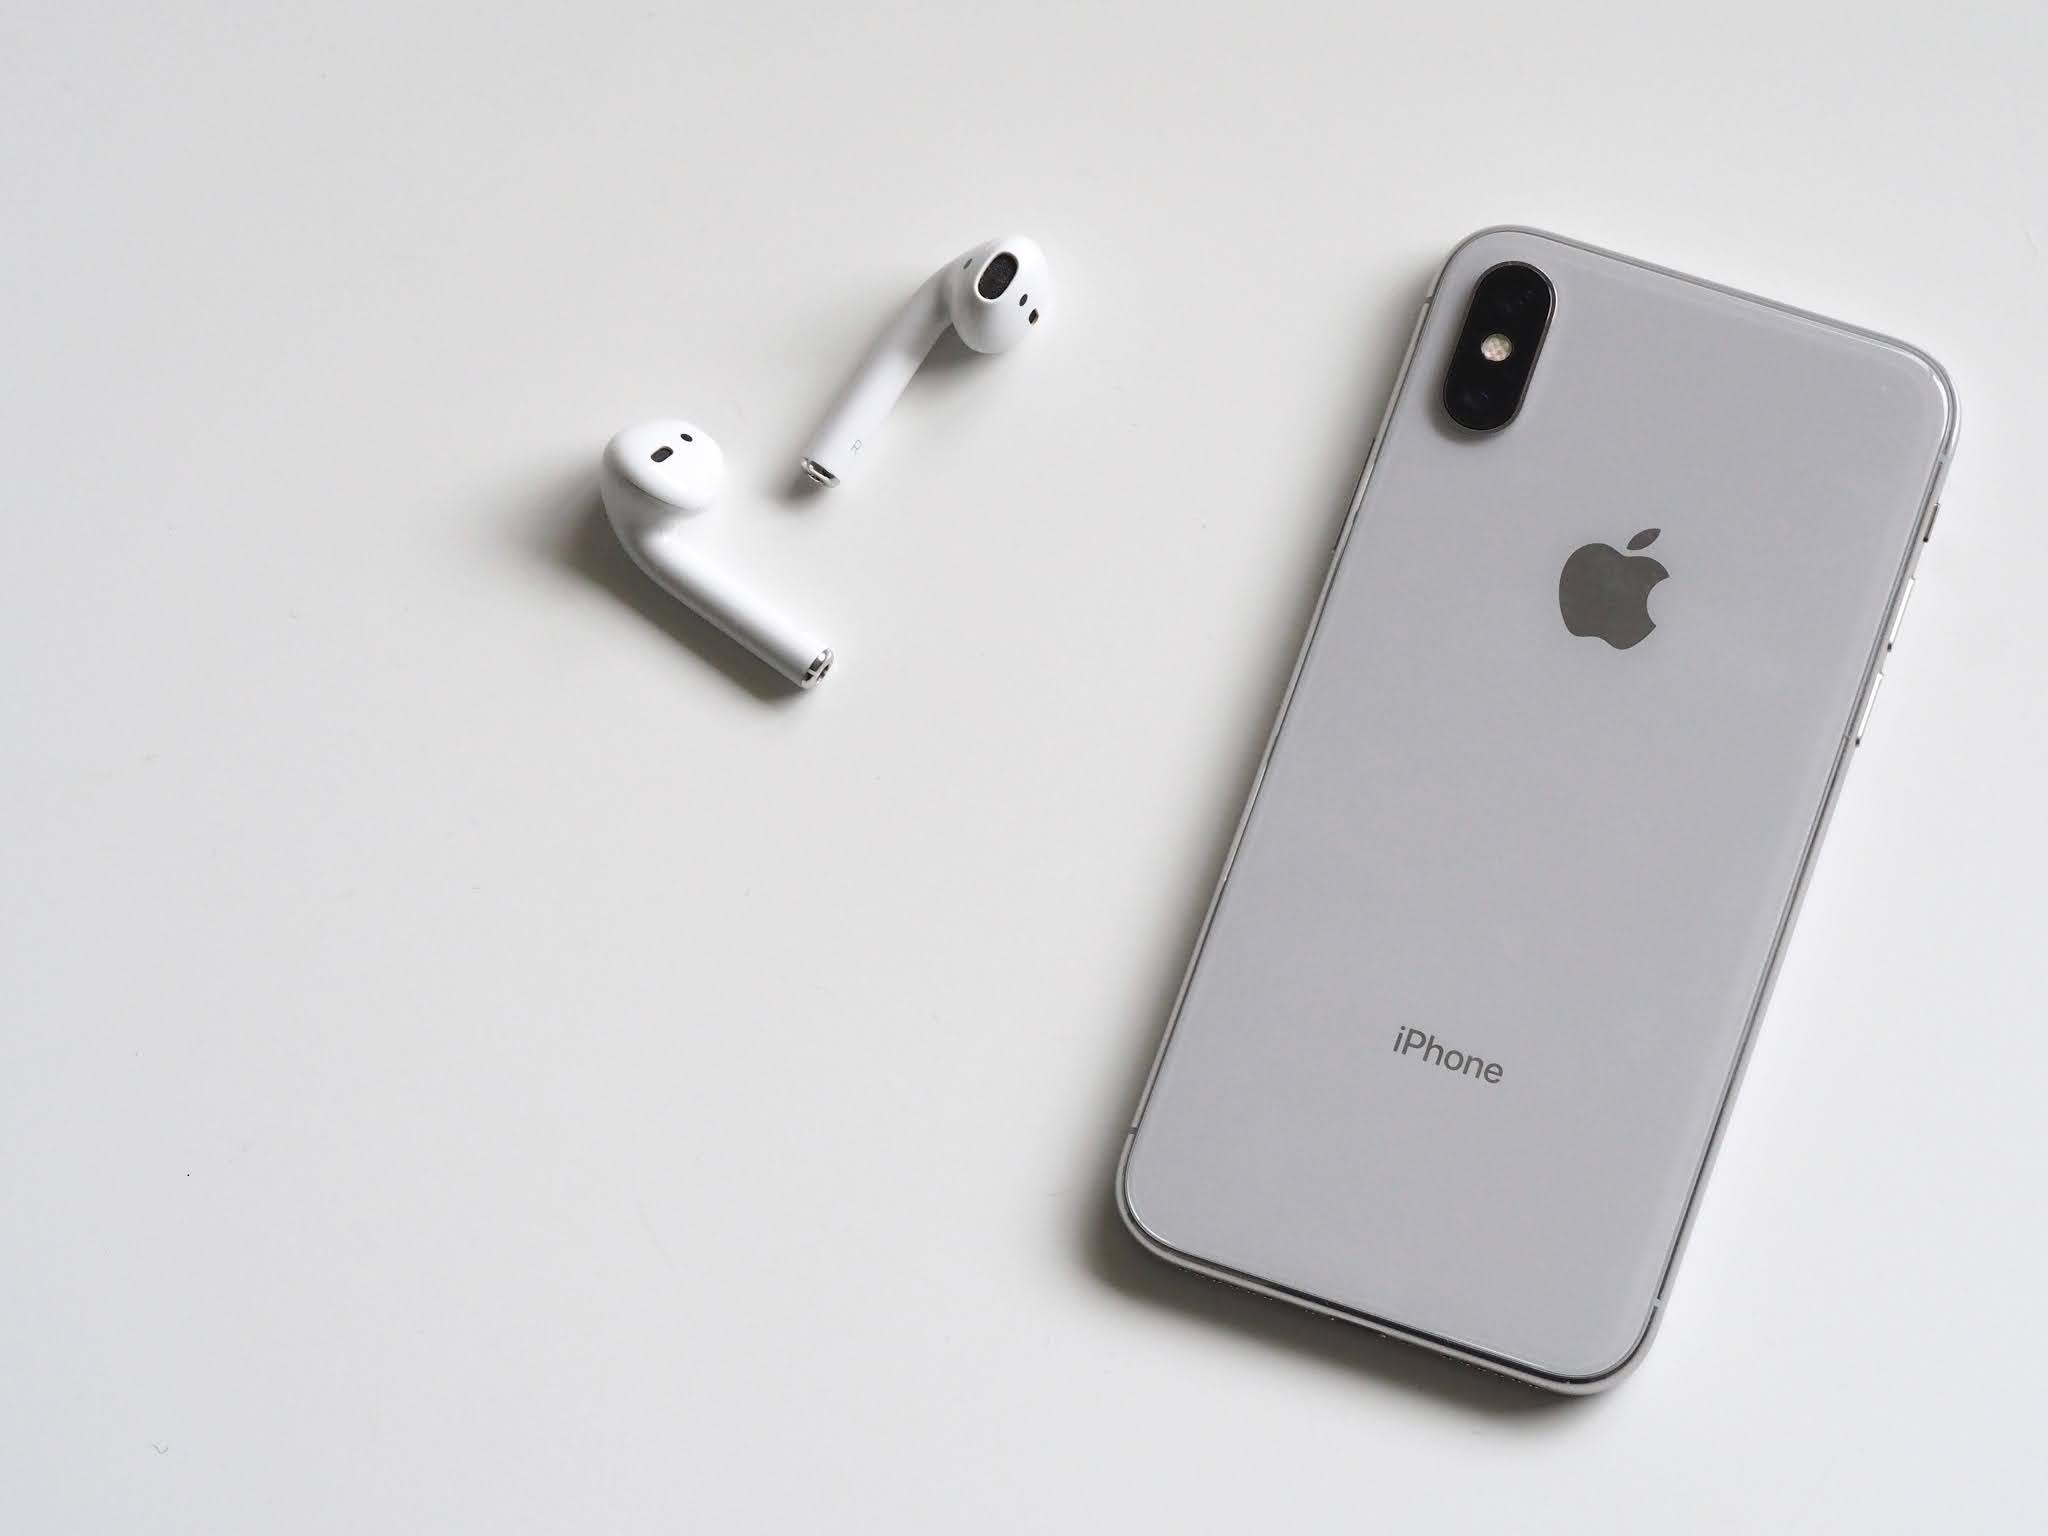 iPhone XS iPhone Xs: المواصفات والميزات والسعر